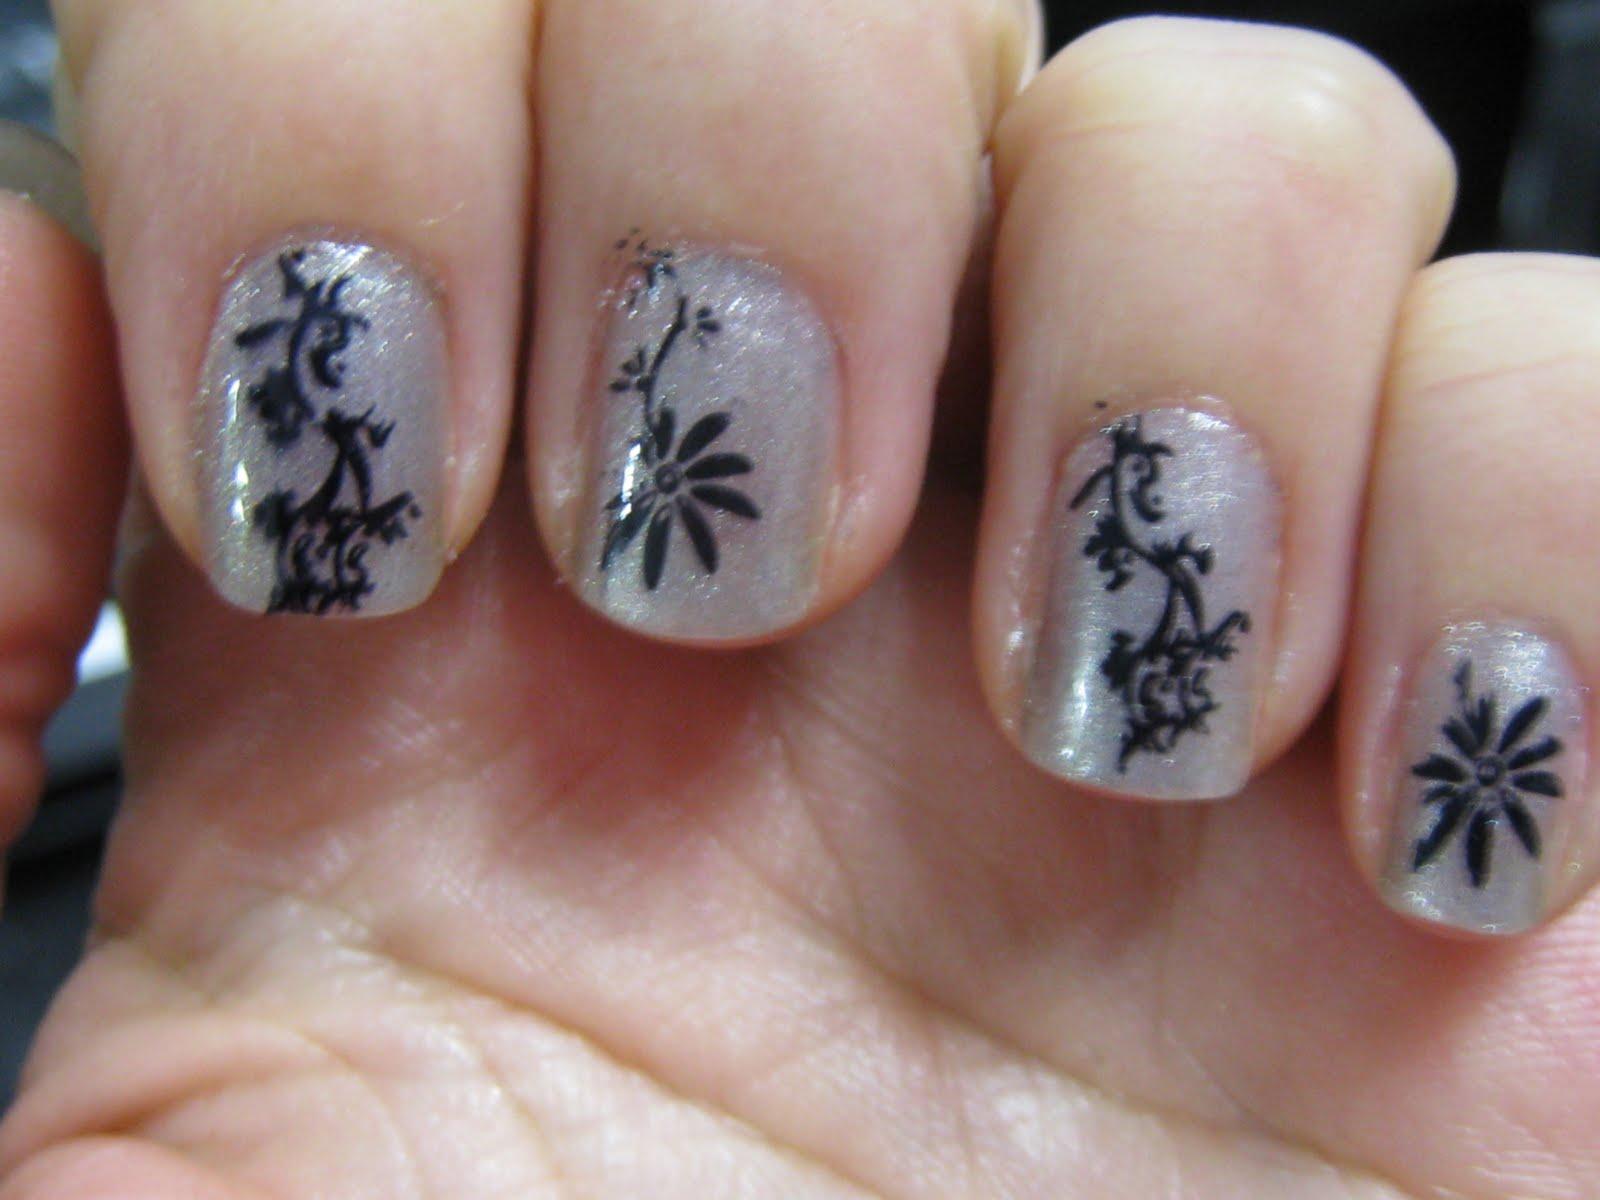 Awesome Konad Nail Art Composition - Nail Art Ideas - morihati.com